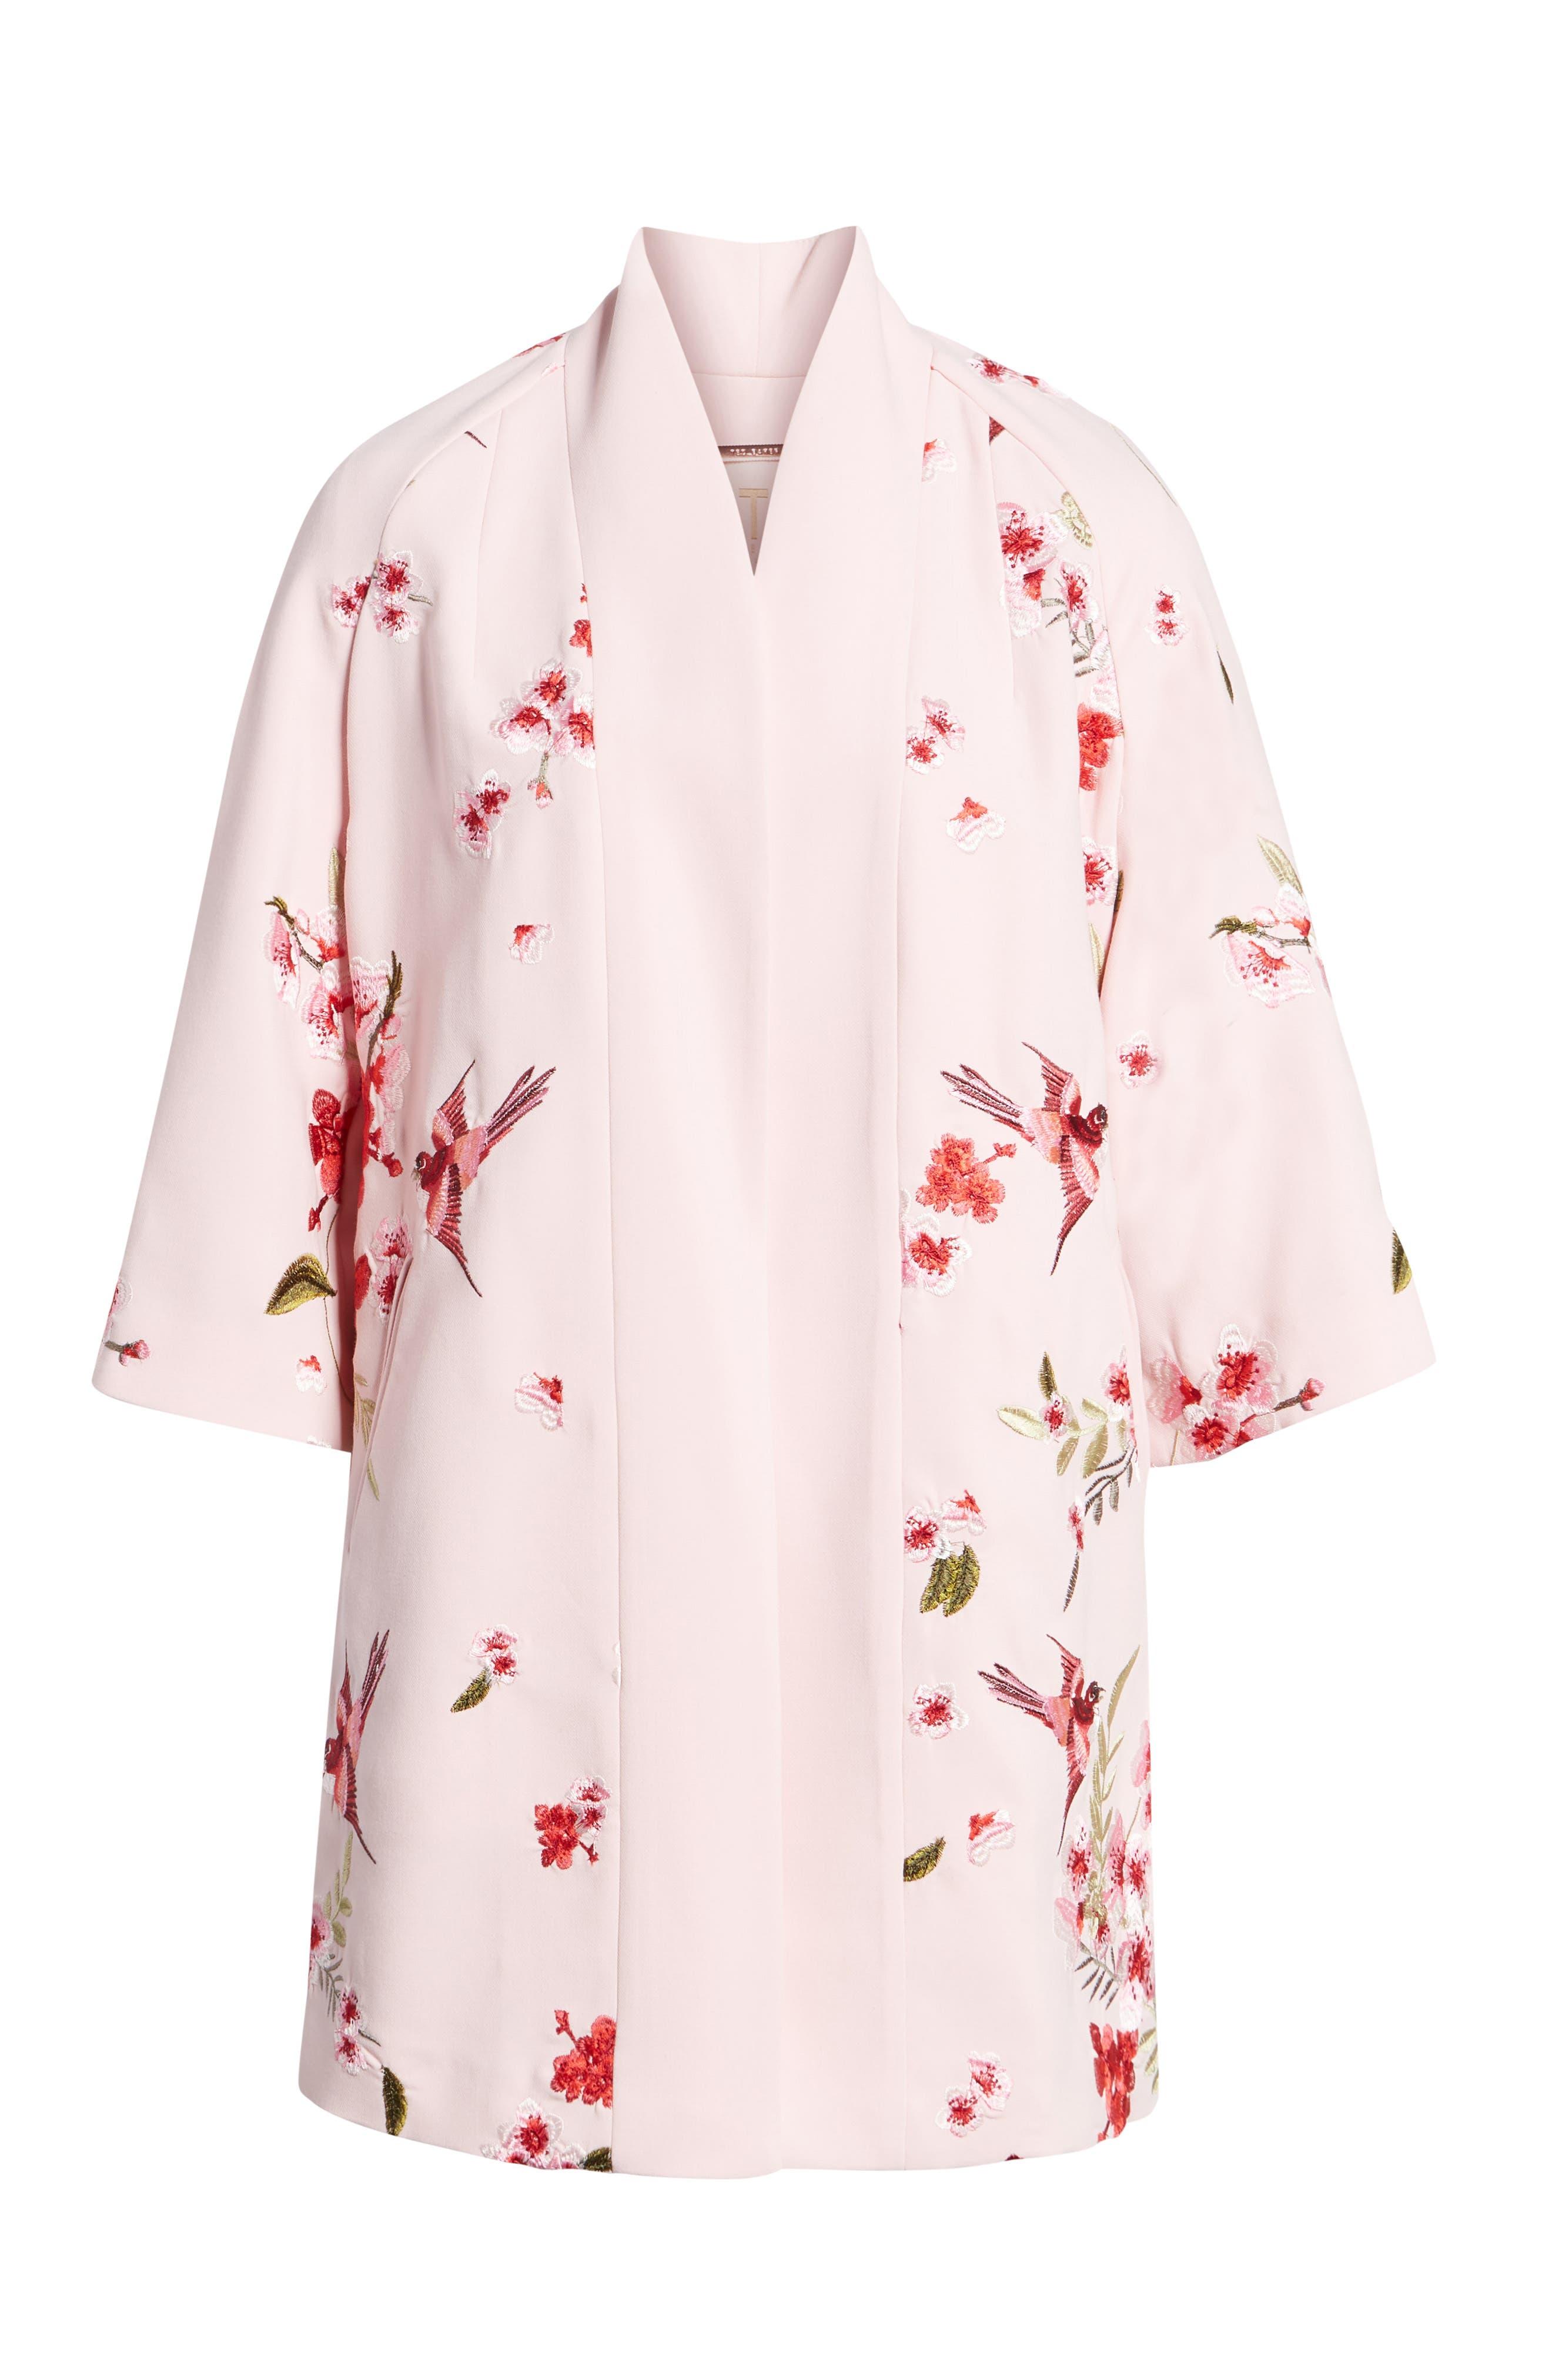 Bird & Blossom Spring Kimono,                             Alternate thumbnail 7, color,                             Baby Pink